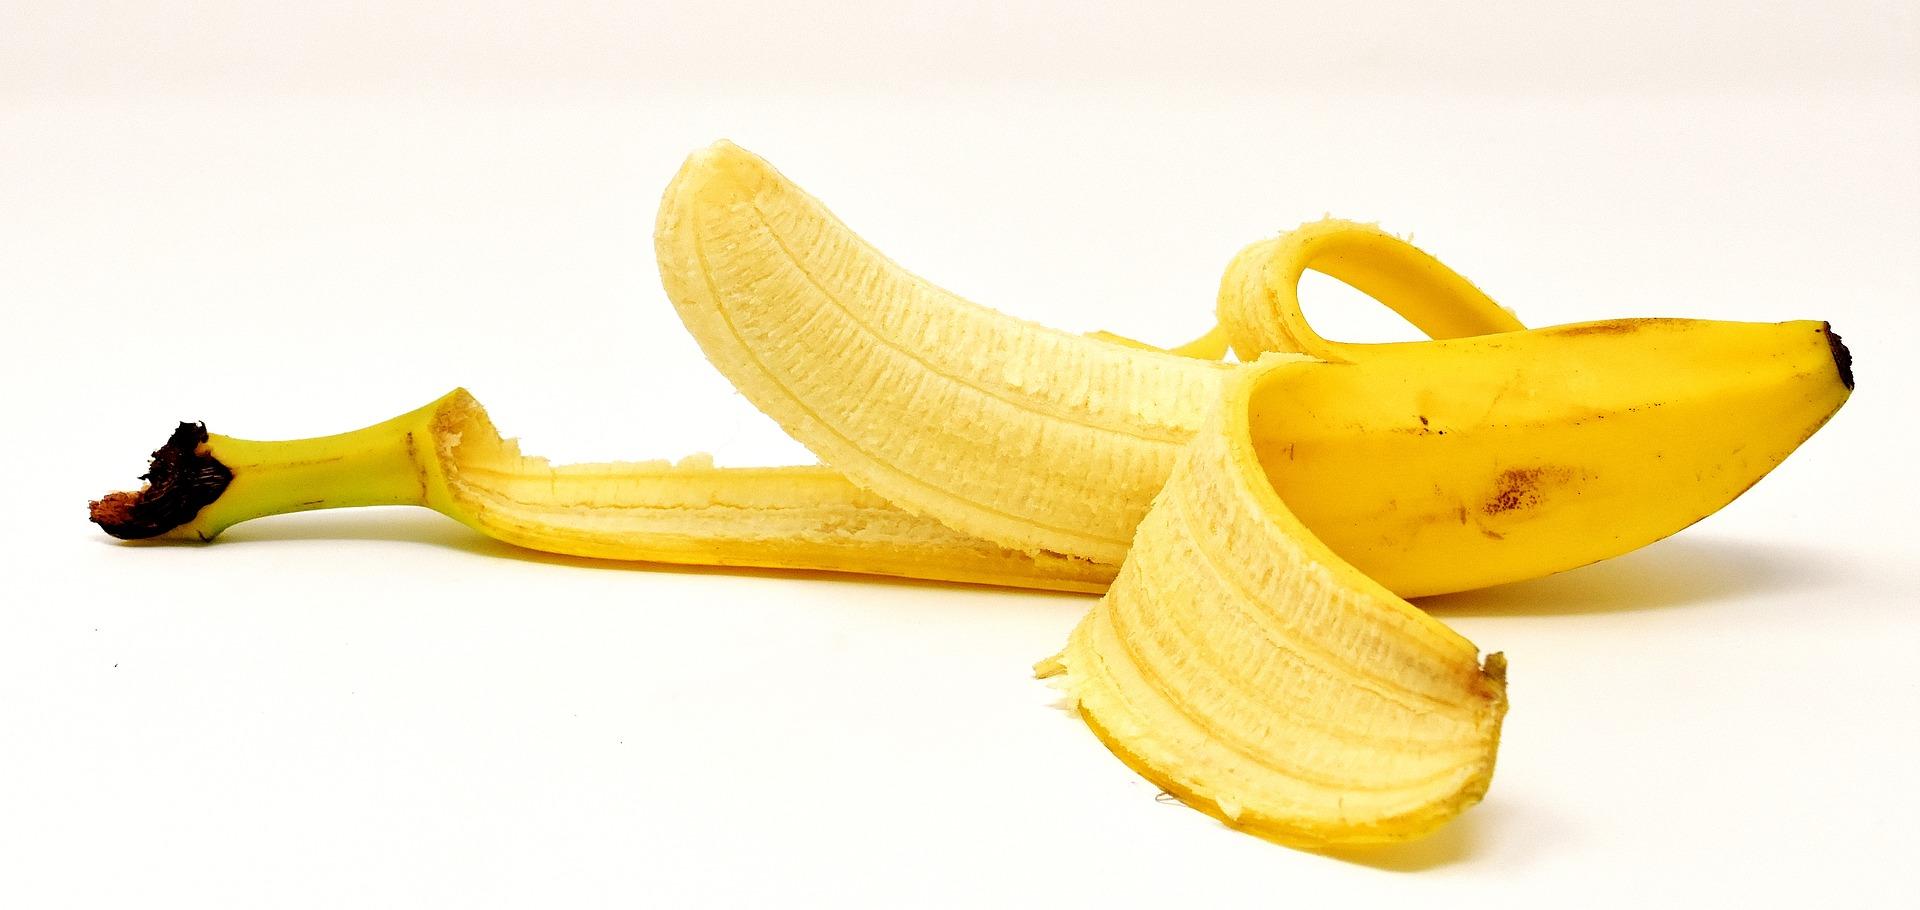 Cand se mananca bananele